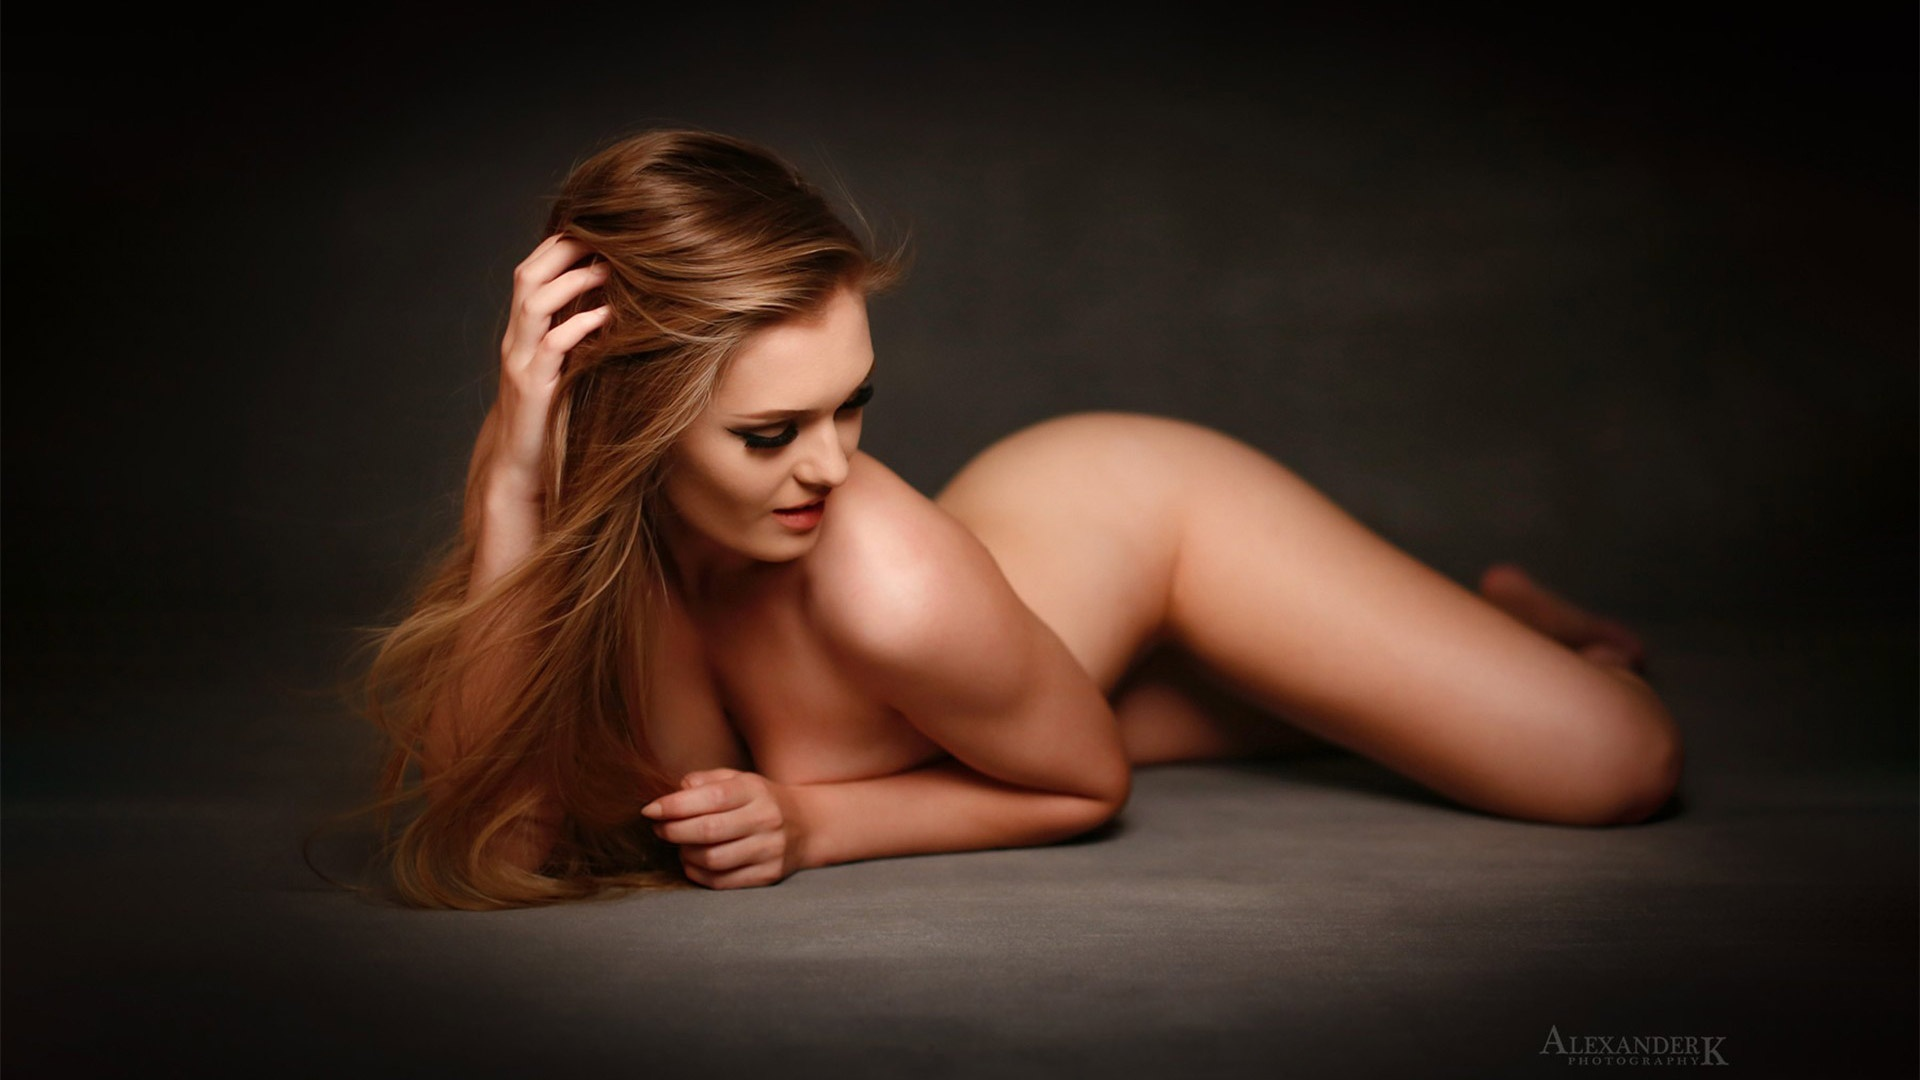 Amanda celebrity nude fakes